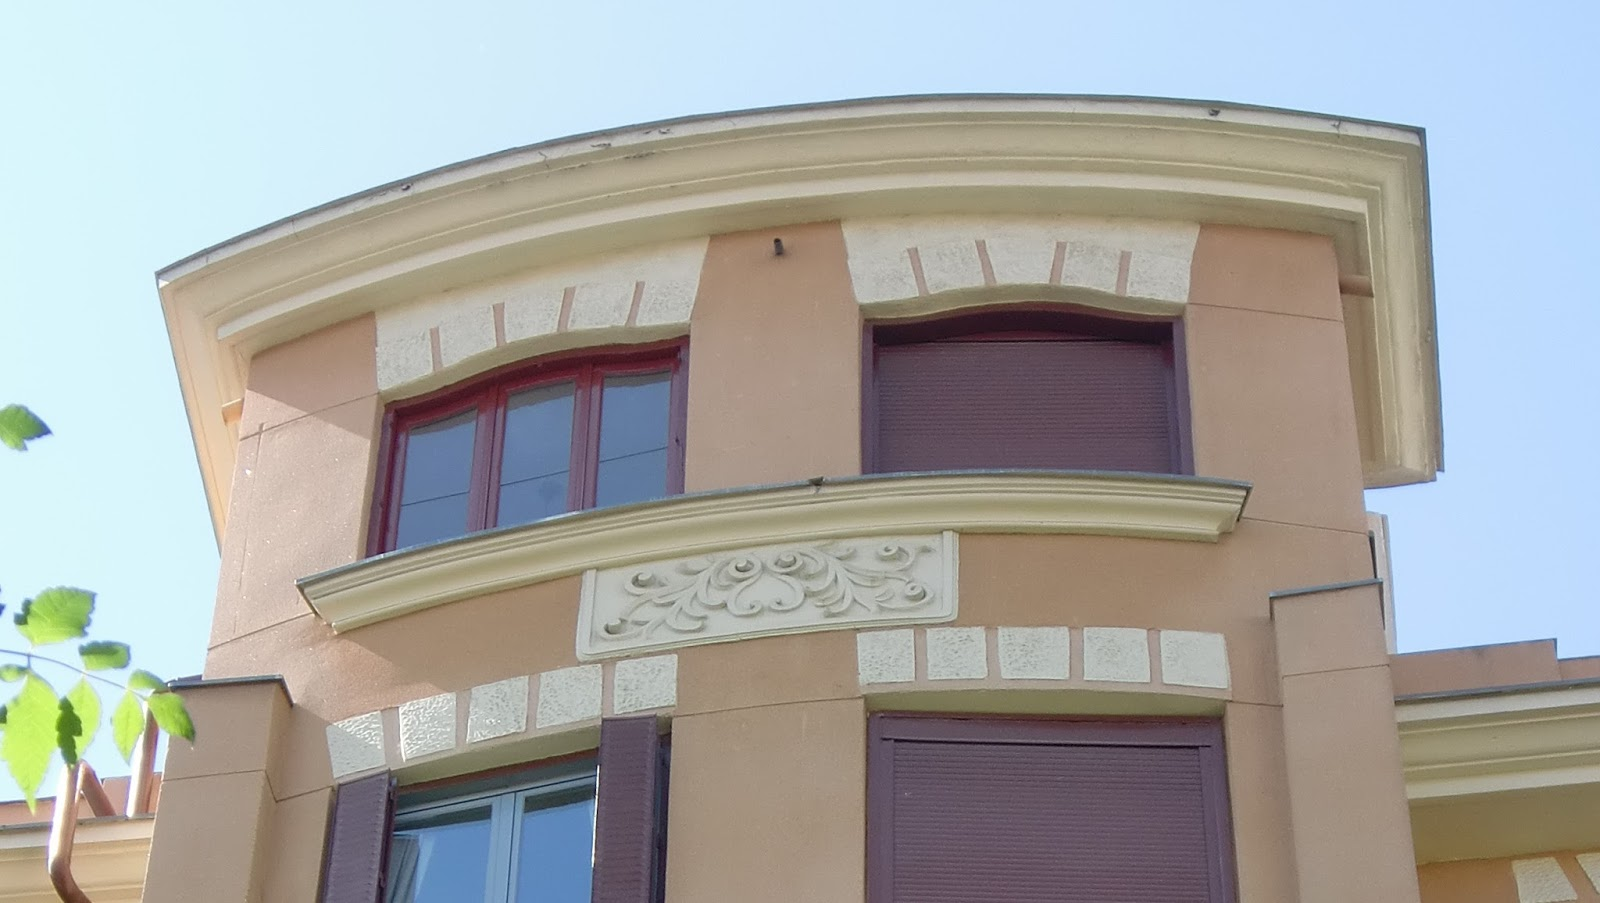 Madrid art dec fern ndez de los r os 23 for Arquitectura franquista